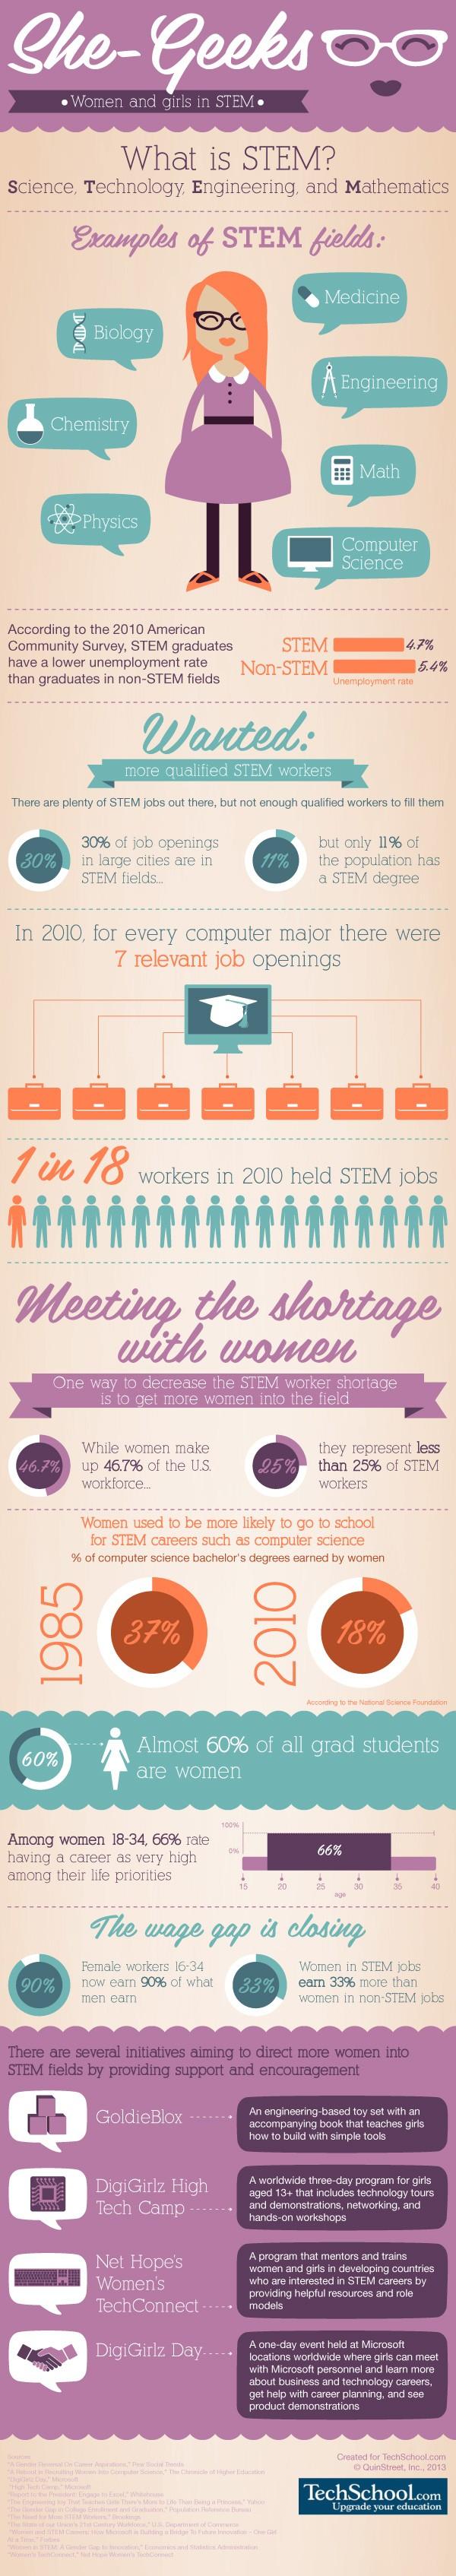 minding the gender gap women leaving stem careers girls who minding the gender gap women leaving stem careers